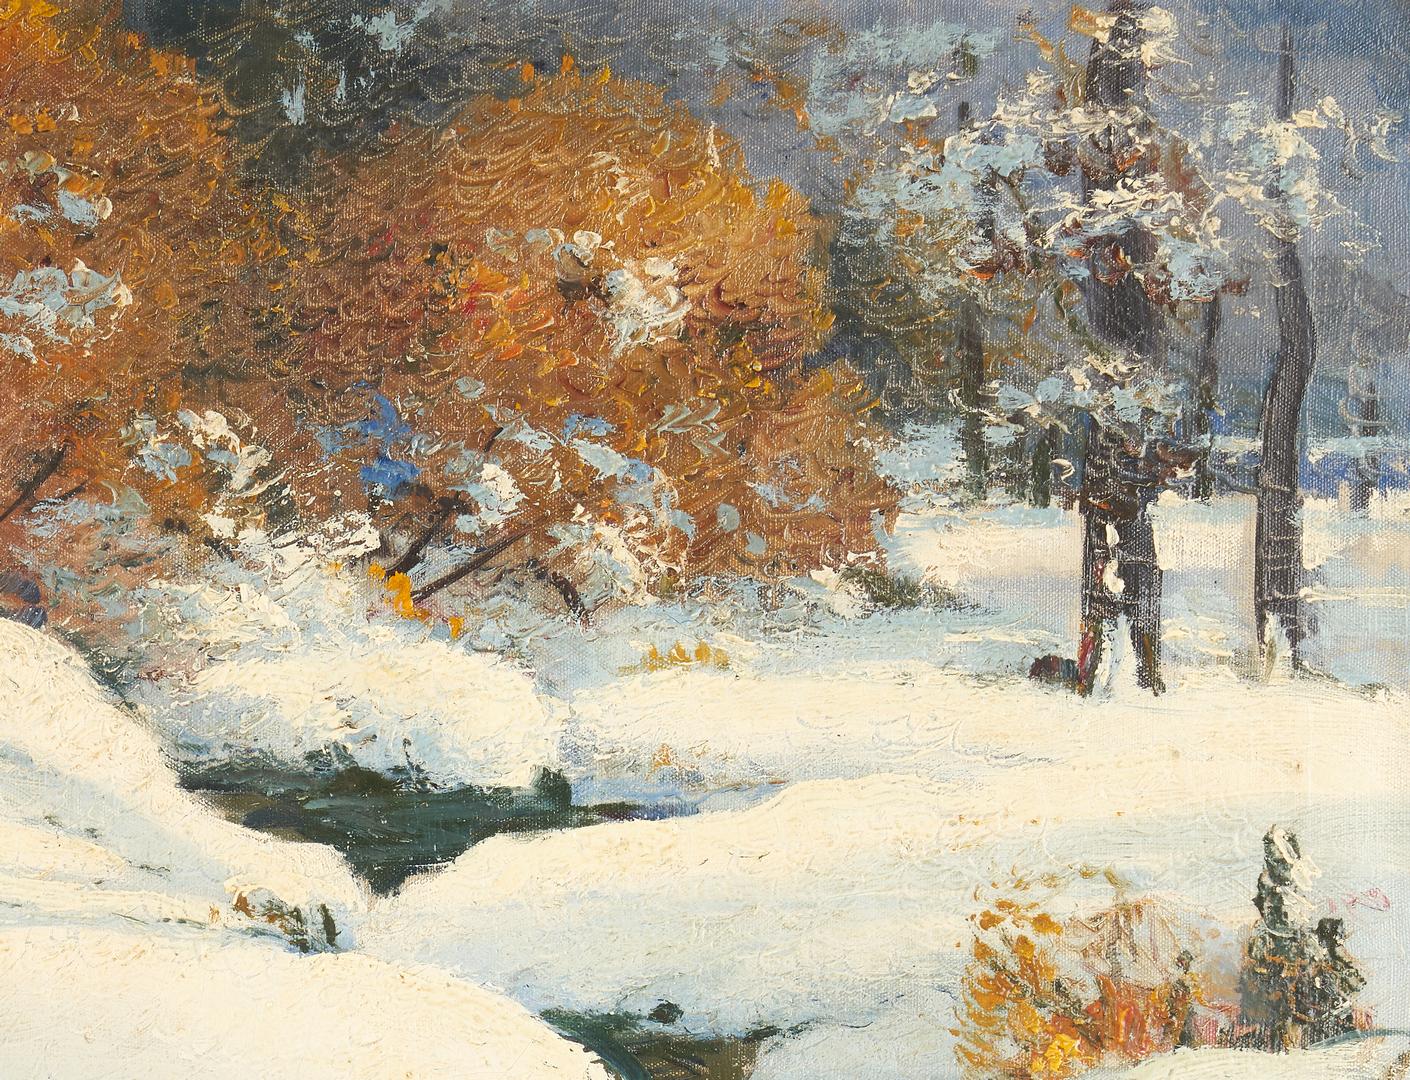 Lot 975: Ernest Fredericks O/C Painting, Indiana Winter Landscape